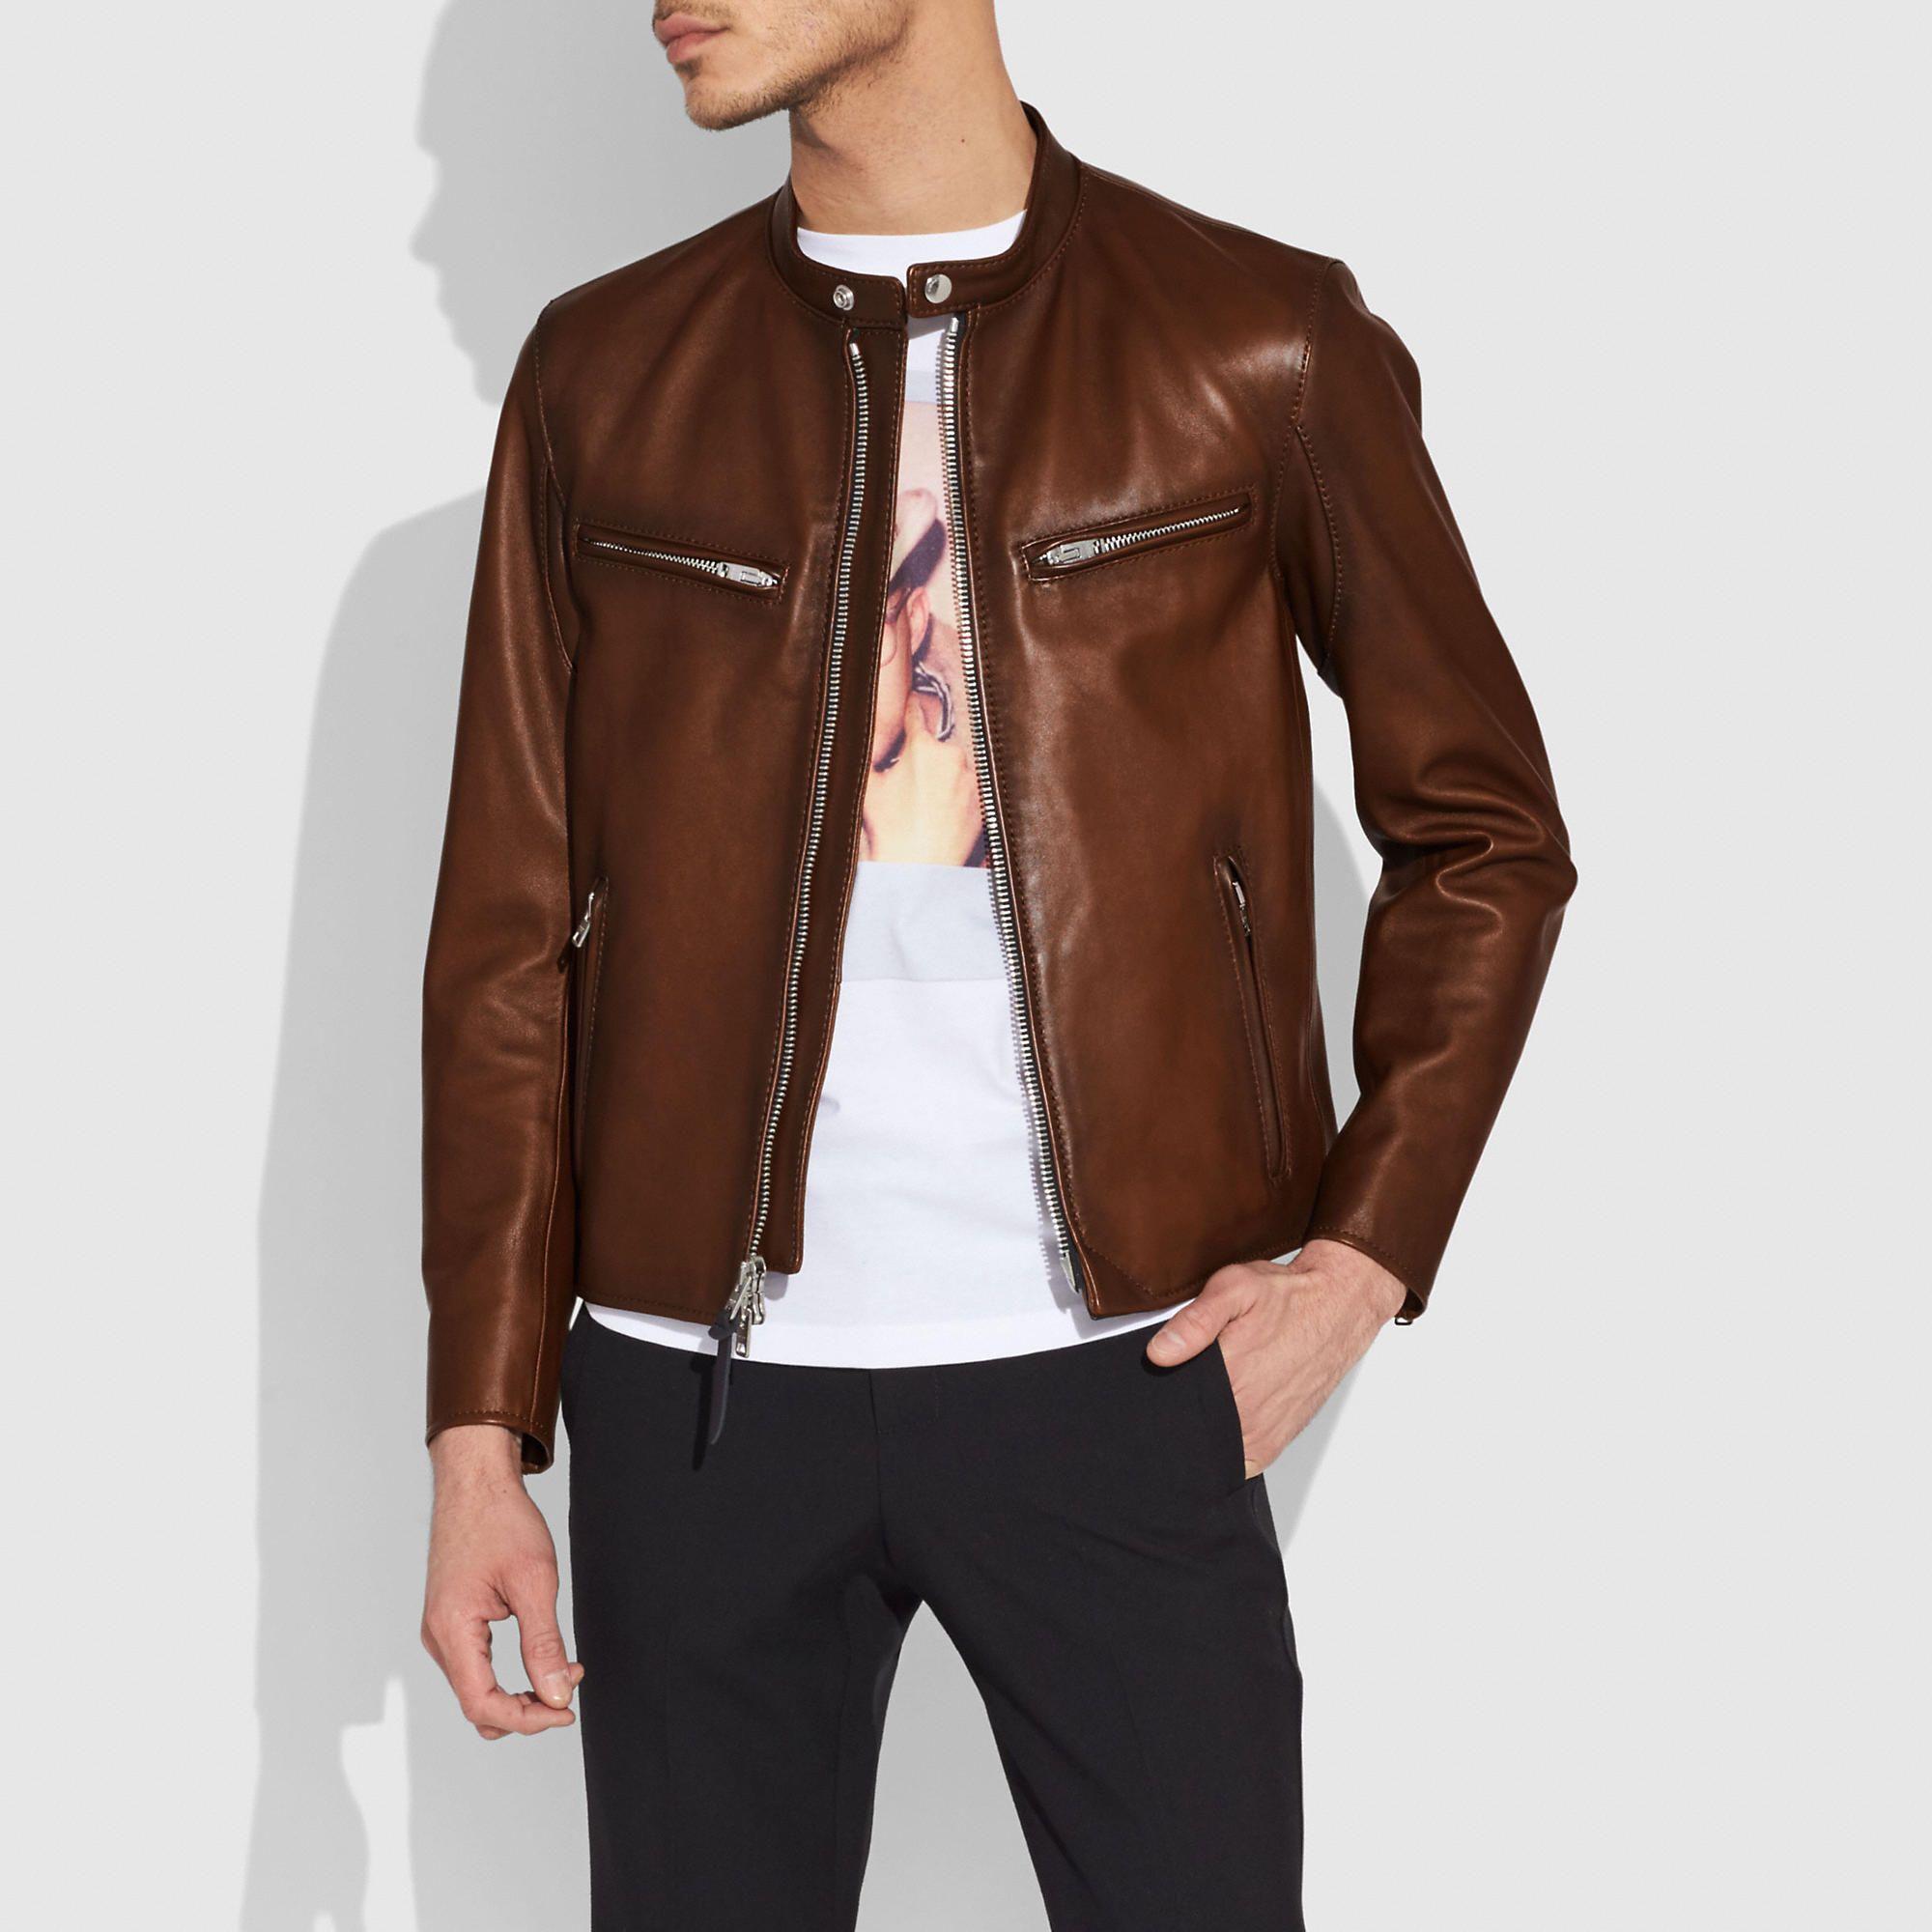 COACH Men's Leather Racer Jacket Luxury clothing brands